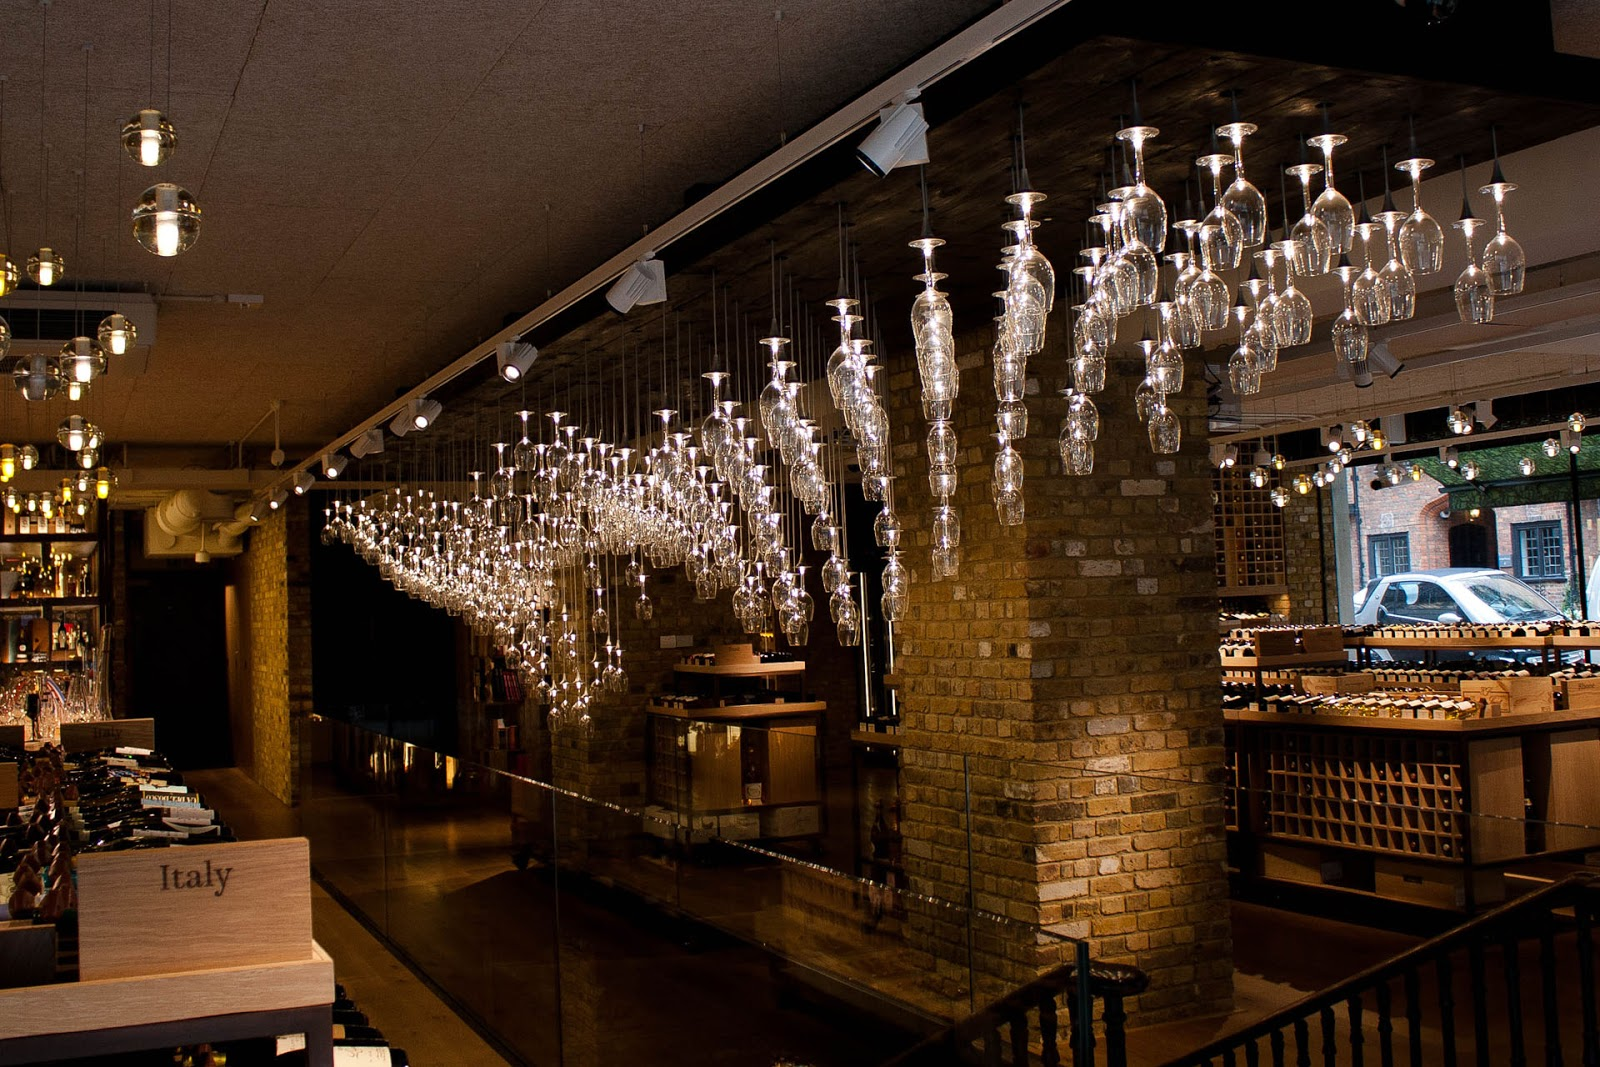 Wetbar Light Architecture Hedonism Wine Mayfair London